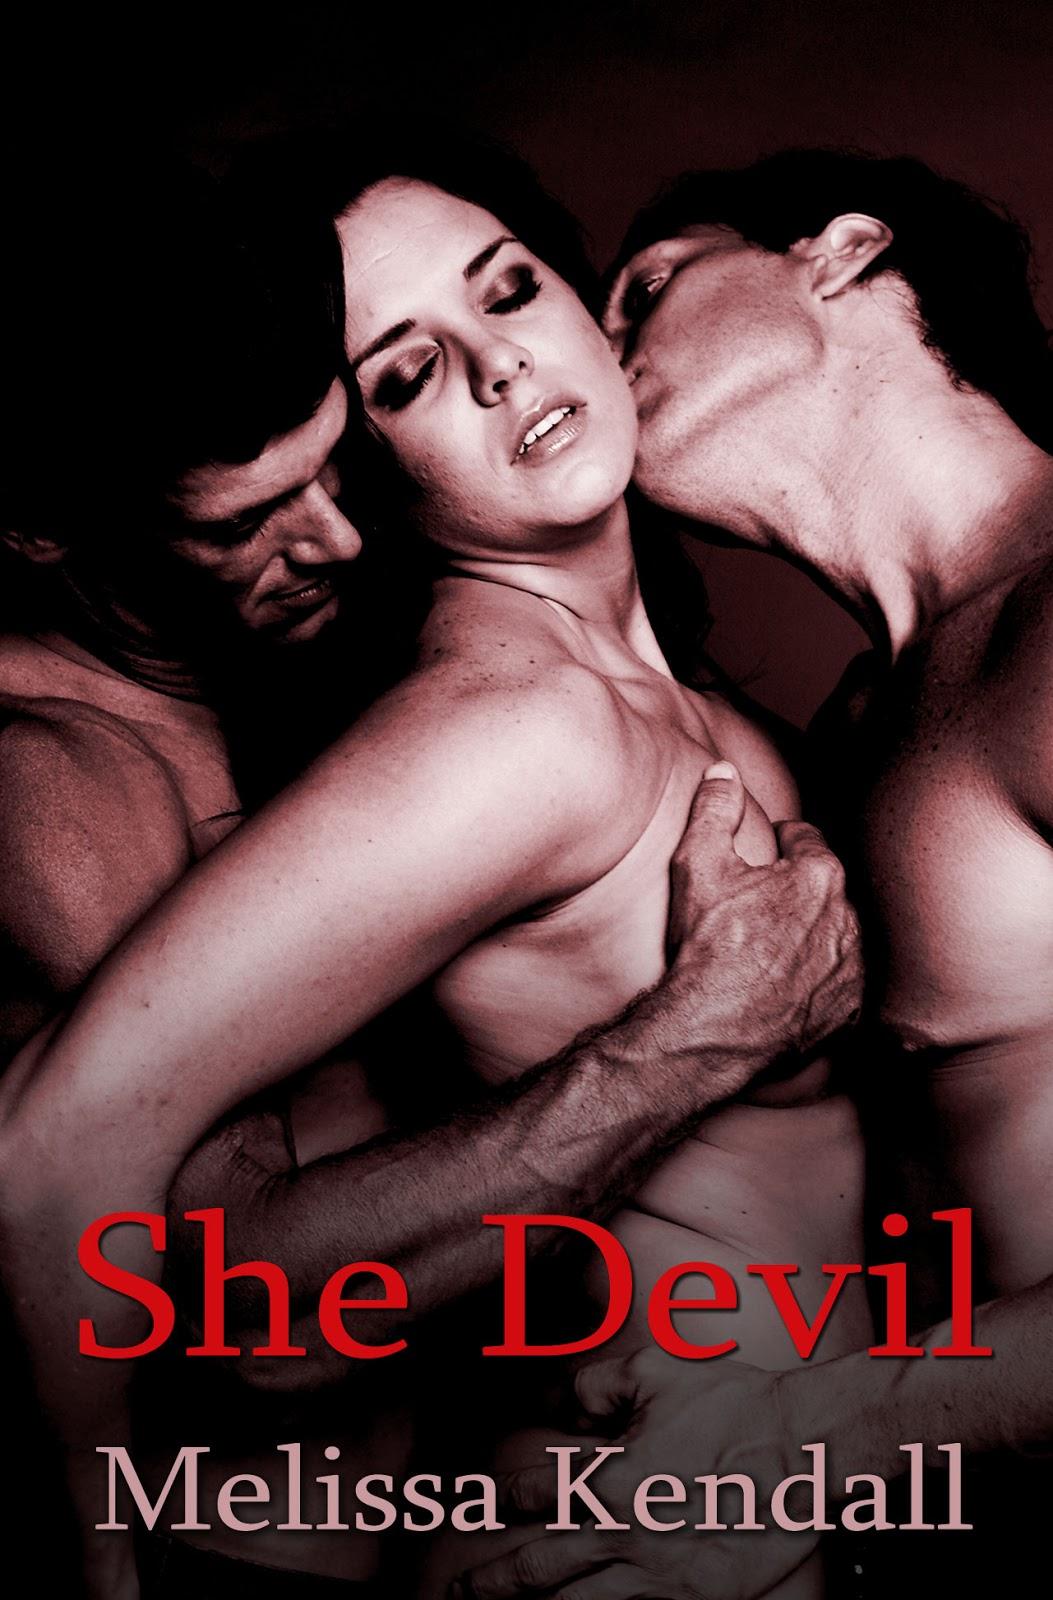 Erotic fiction get away